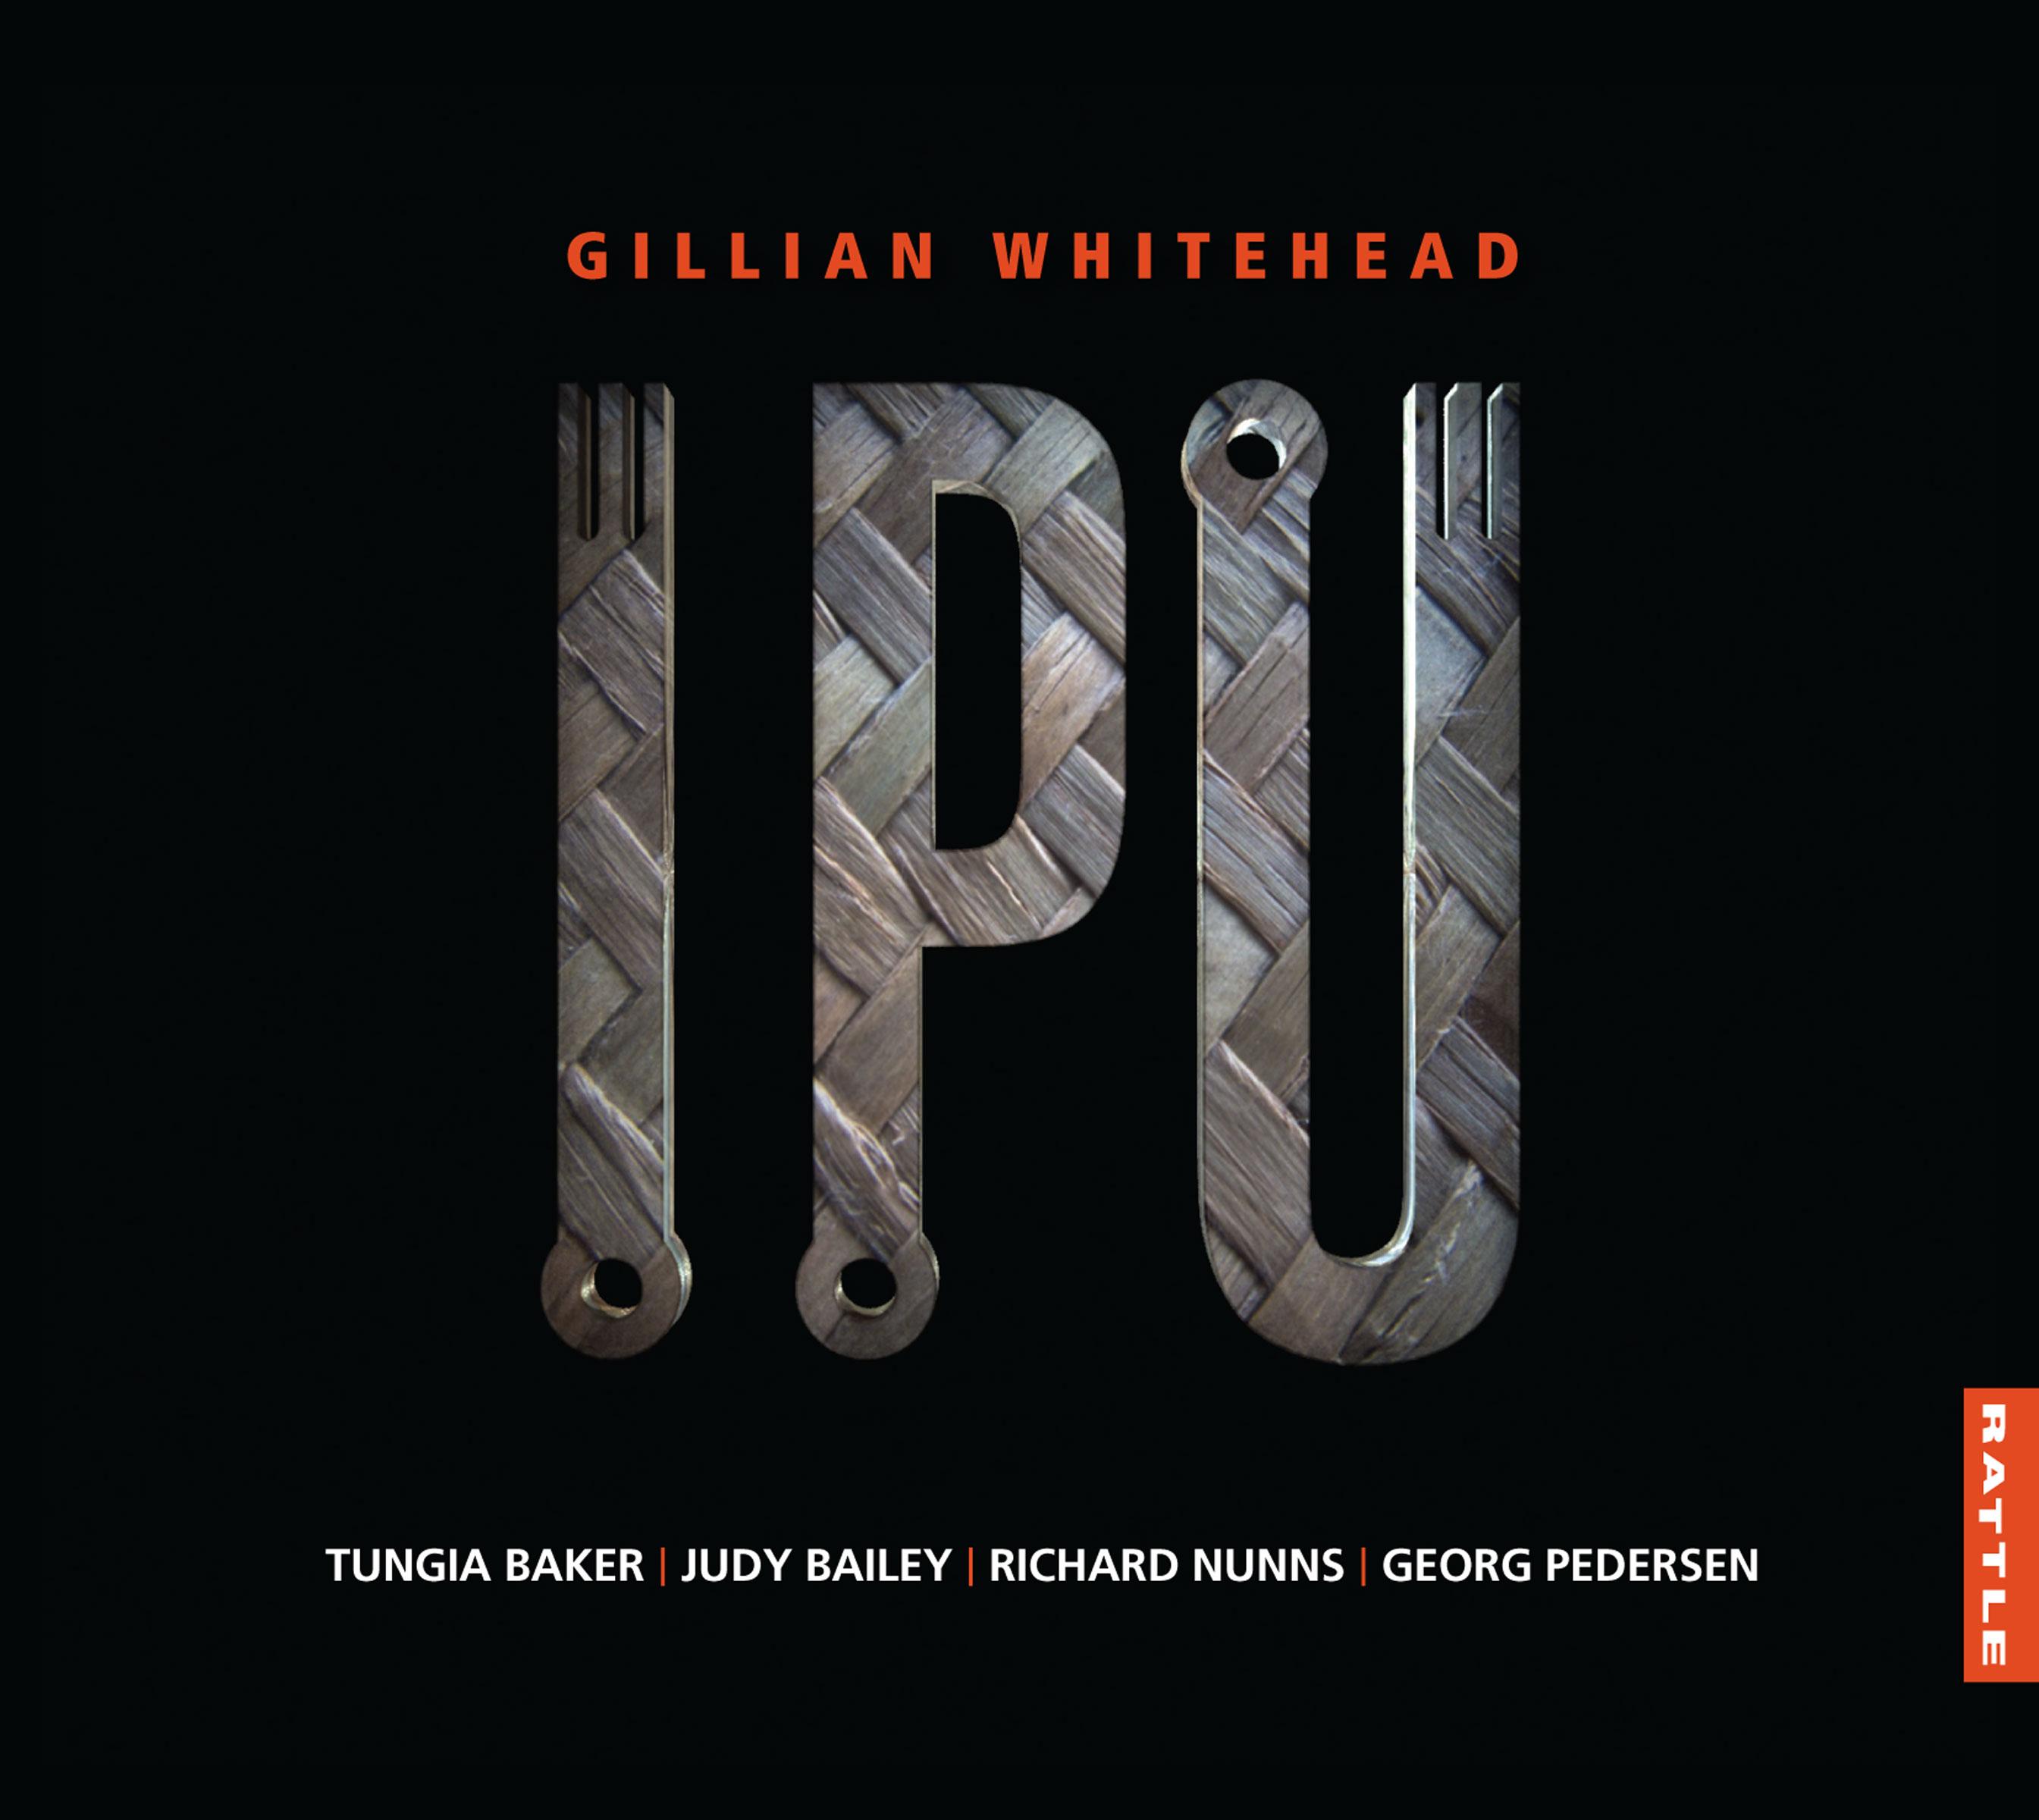 Gillian Whitehead | IPU - downloadable MP3 ALBUM